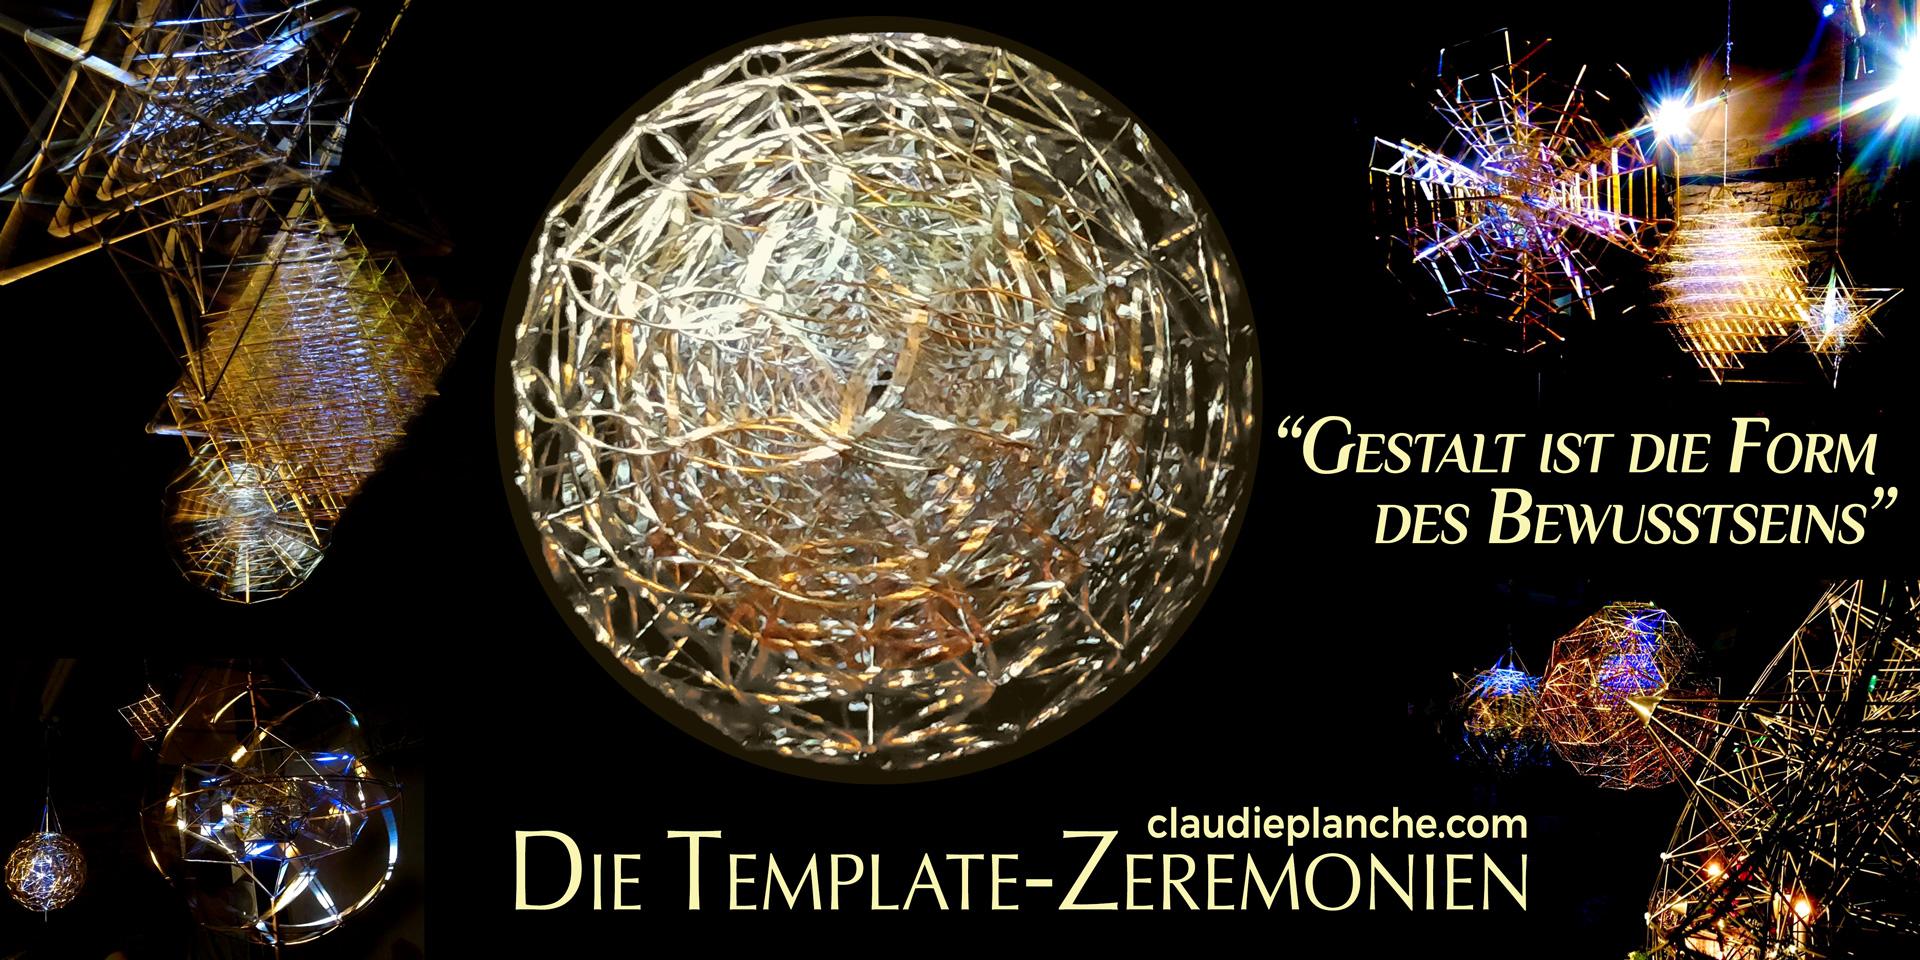 Die Heilige Geometrie der Template Zeremonien